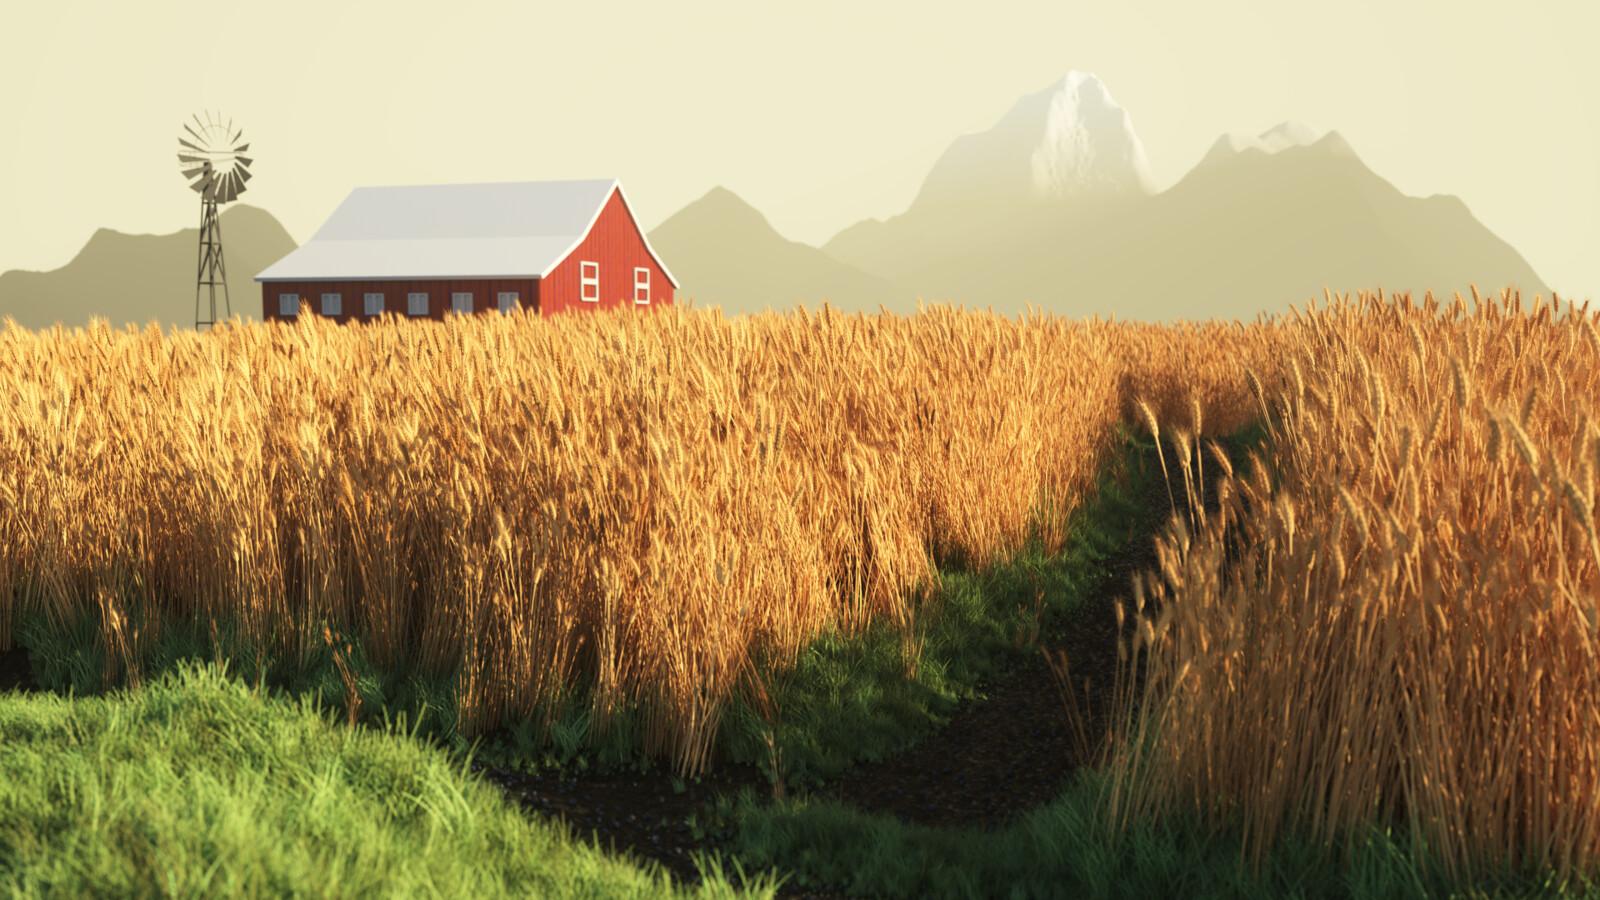 Mardini 2021 Daily Challenge - Rural